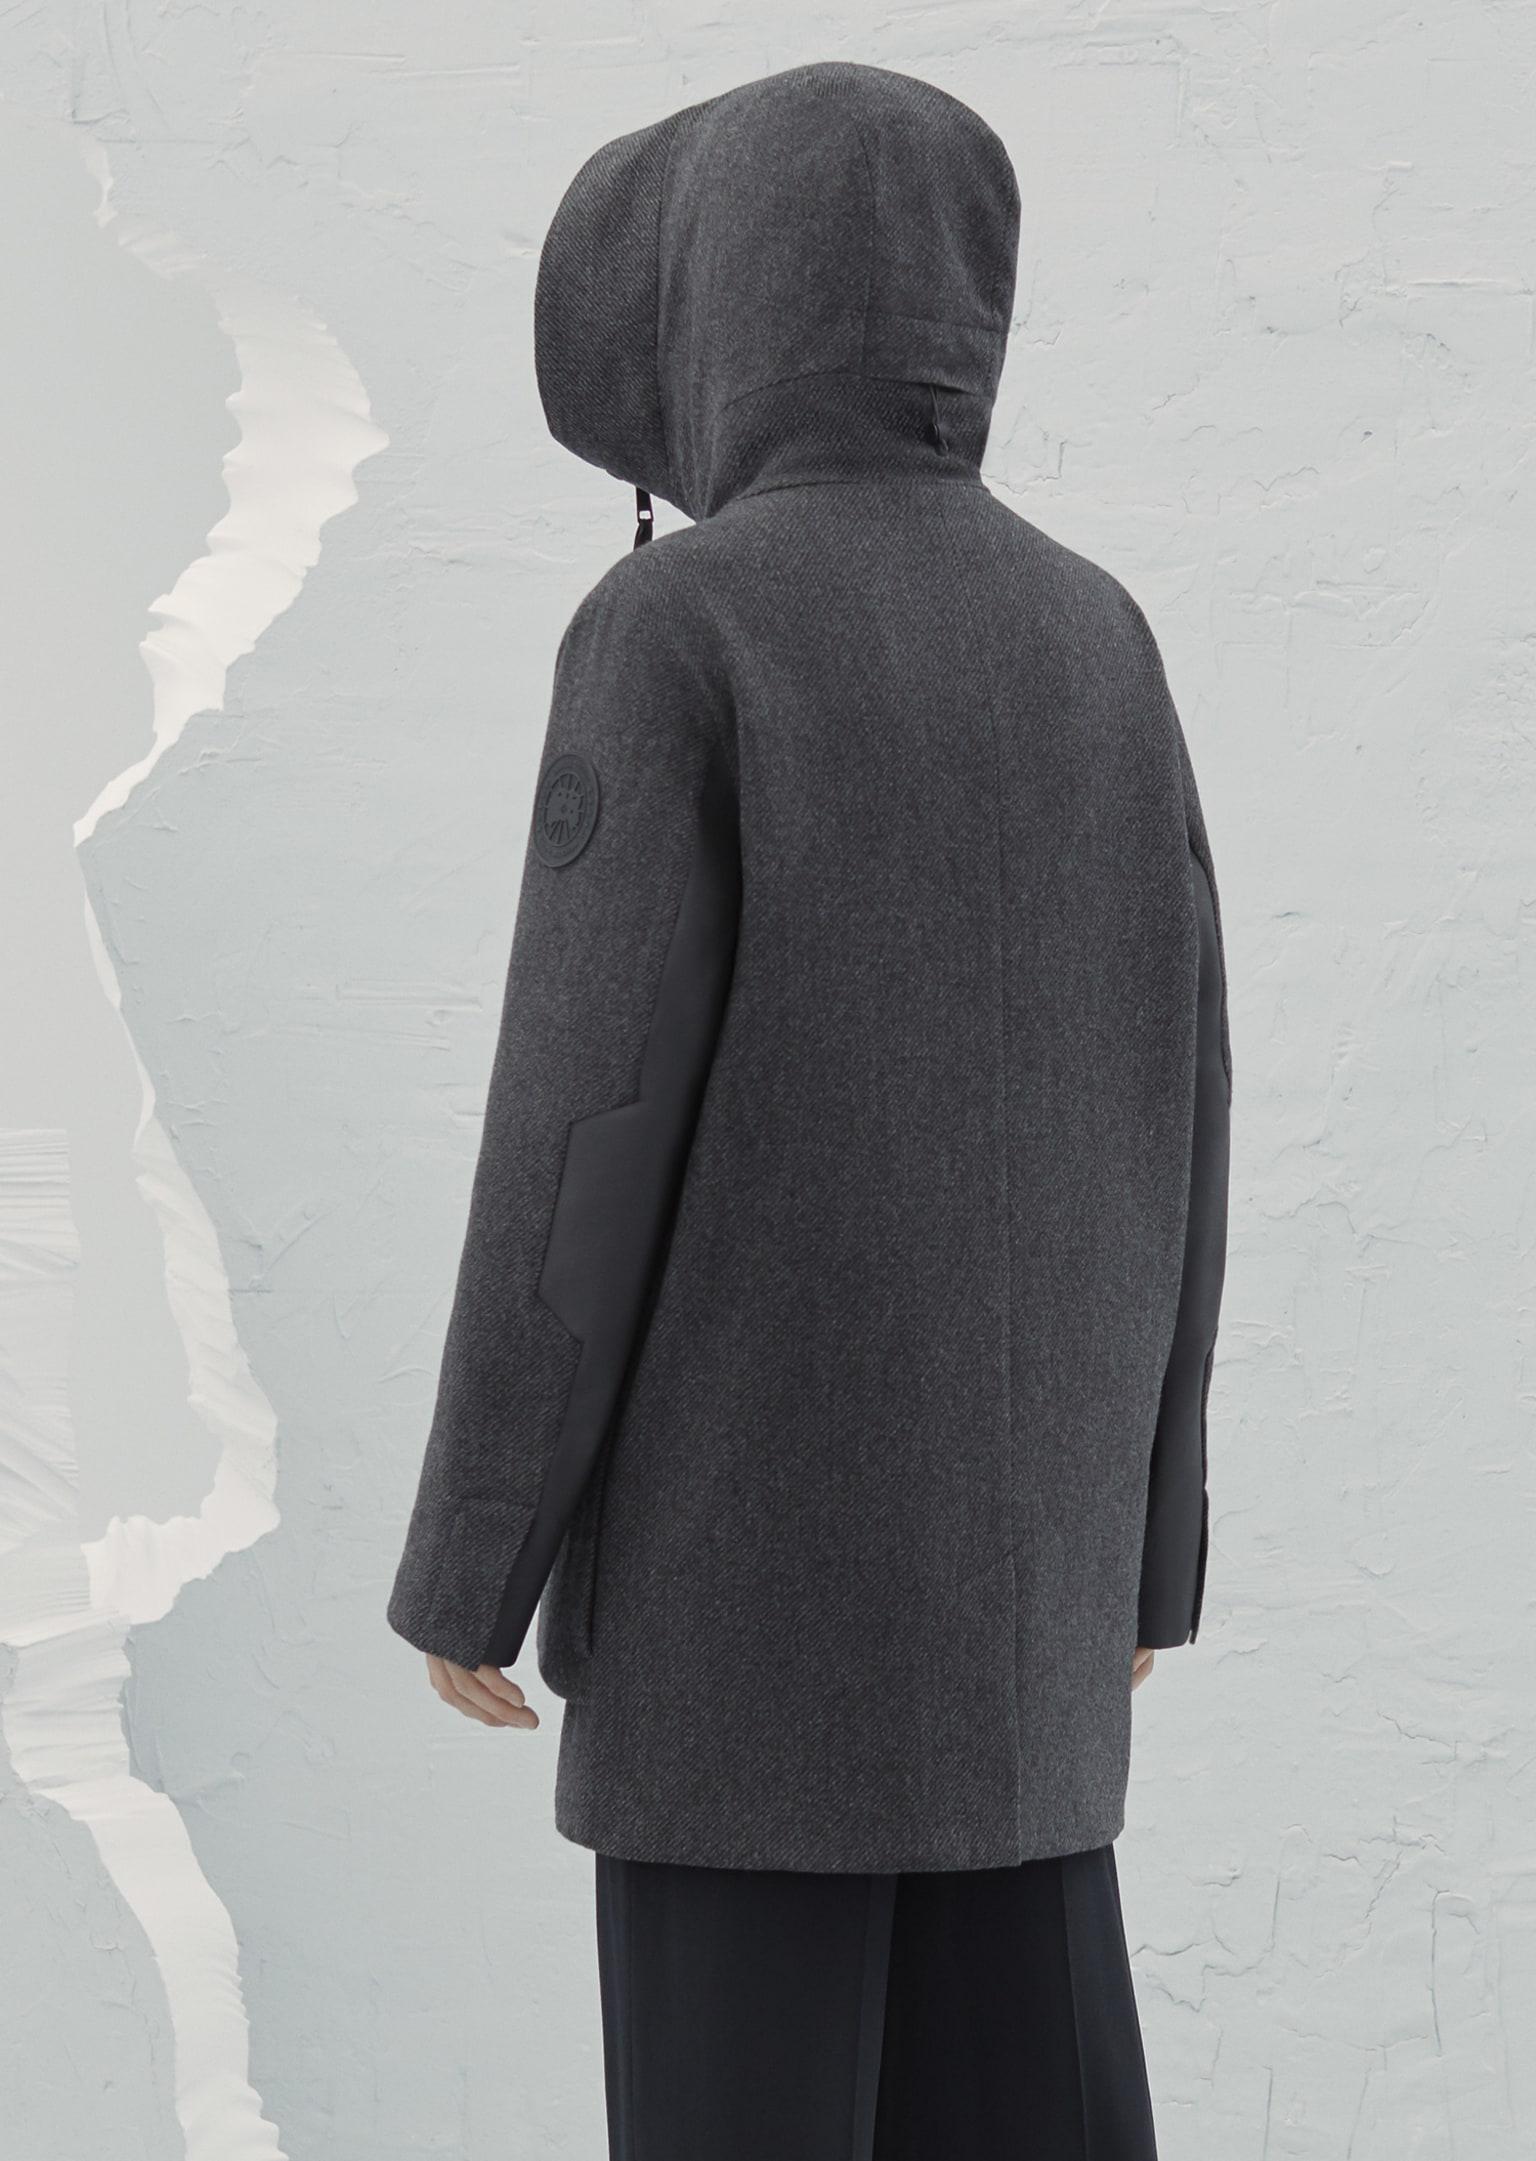 Cappotto Atavist da uomo | Canada Goose